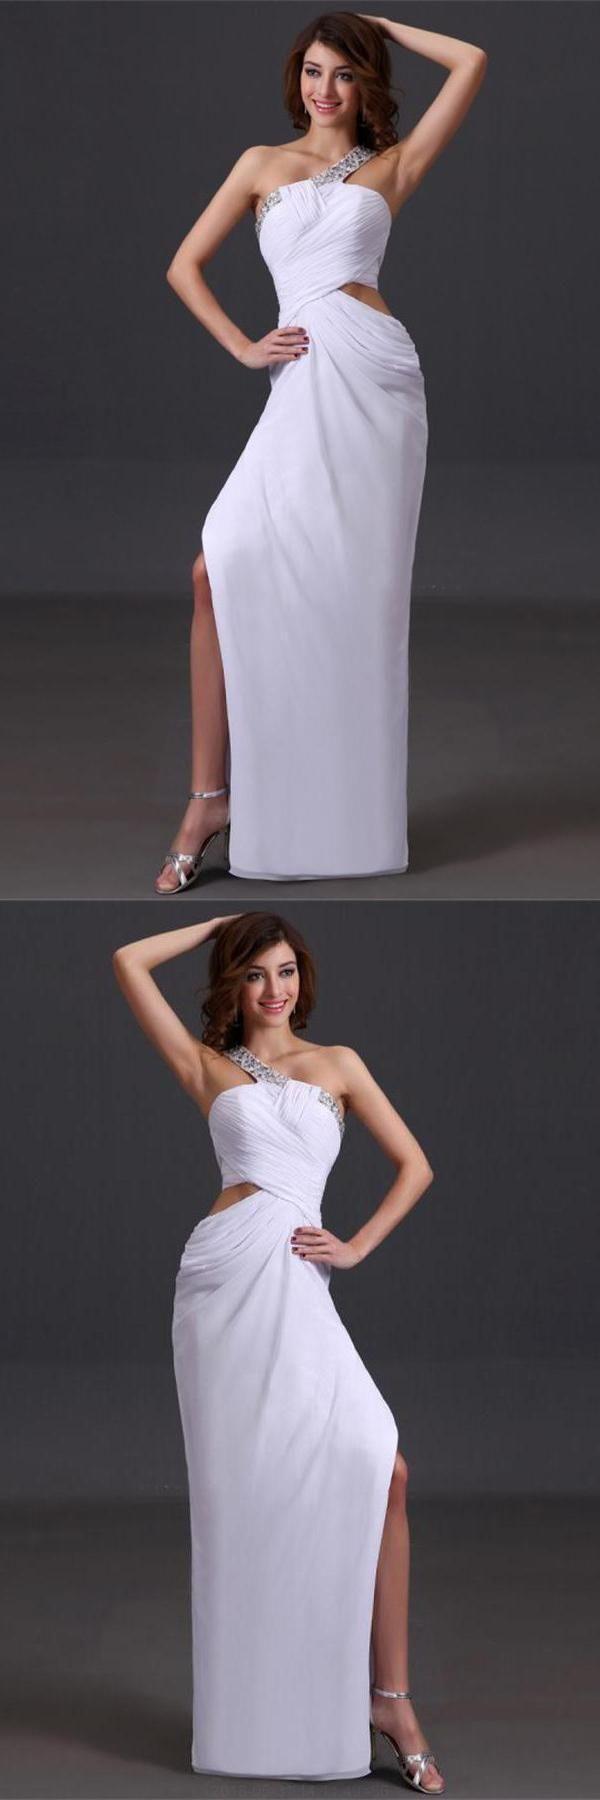 Silver prom dresses chiffon prom dresses long prom dresses prom